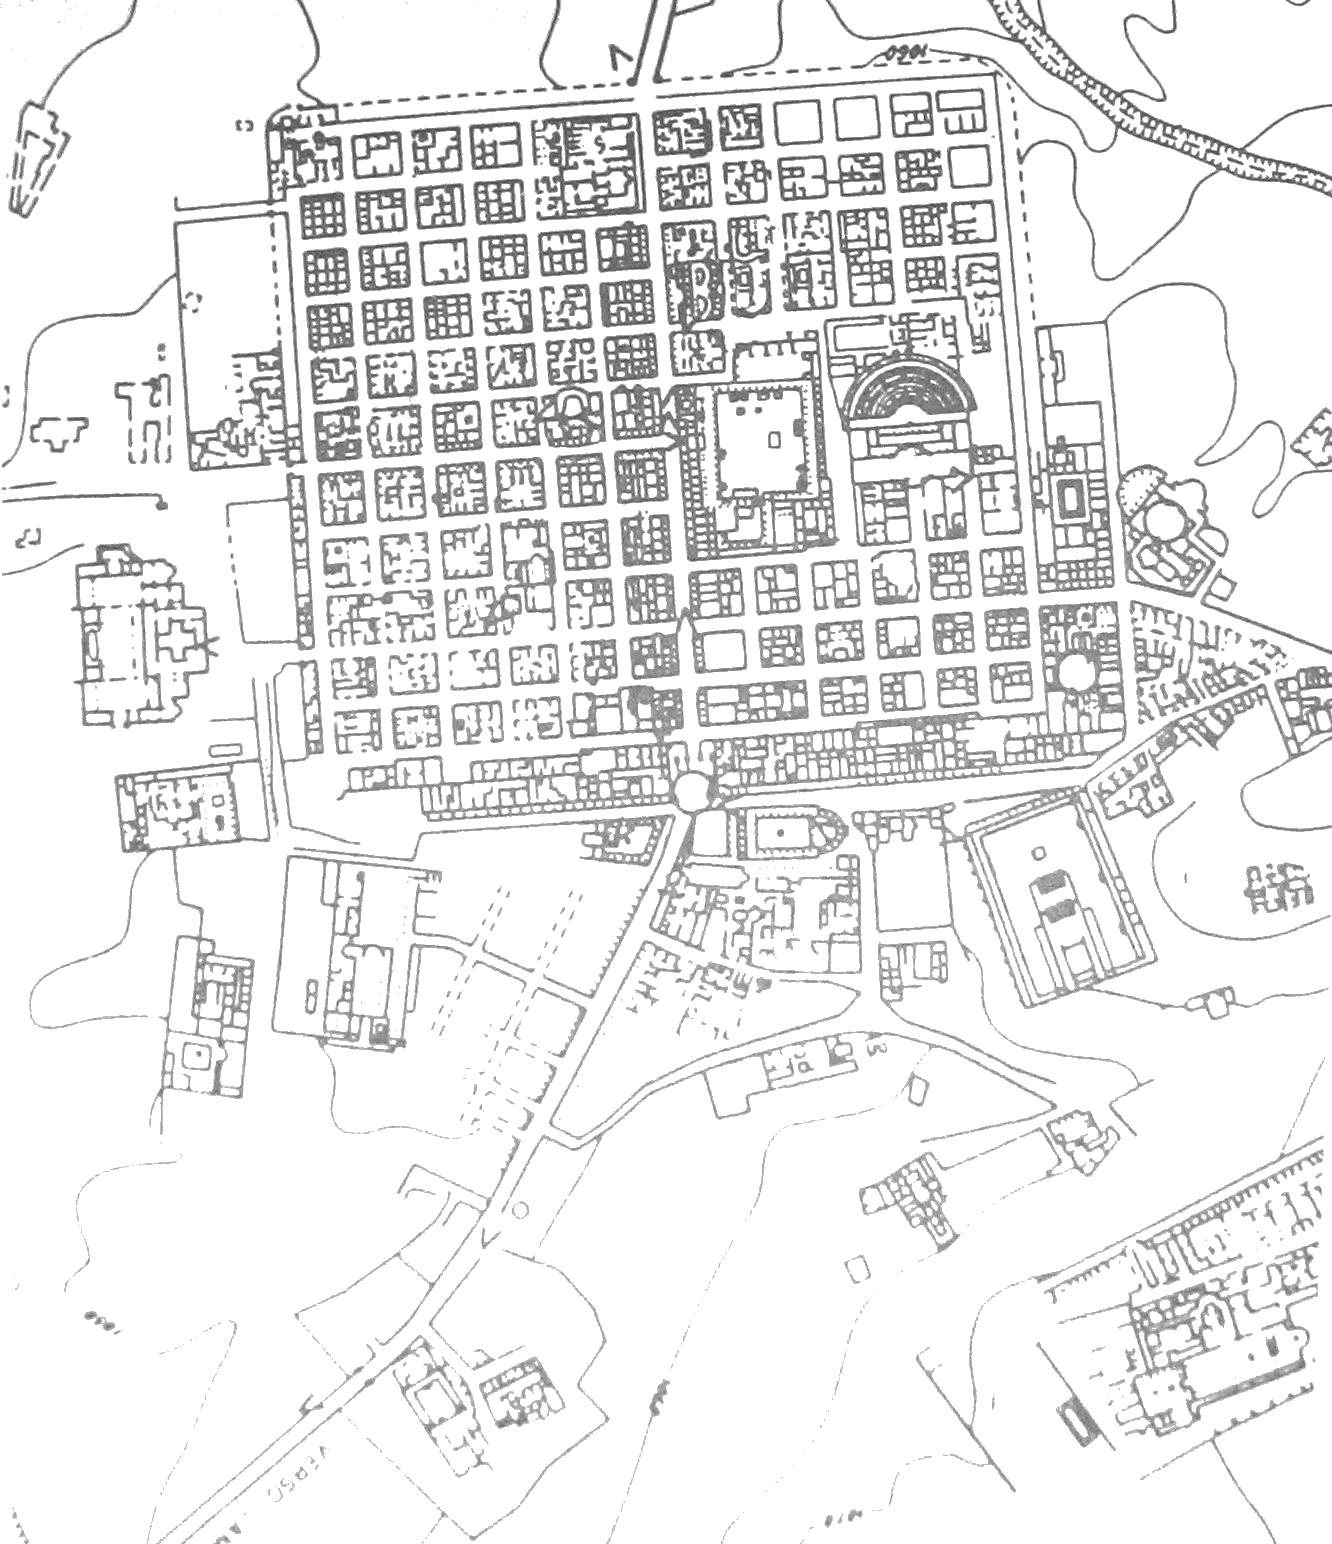 Urbs la structure urbaine de la ville romaine